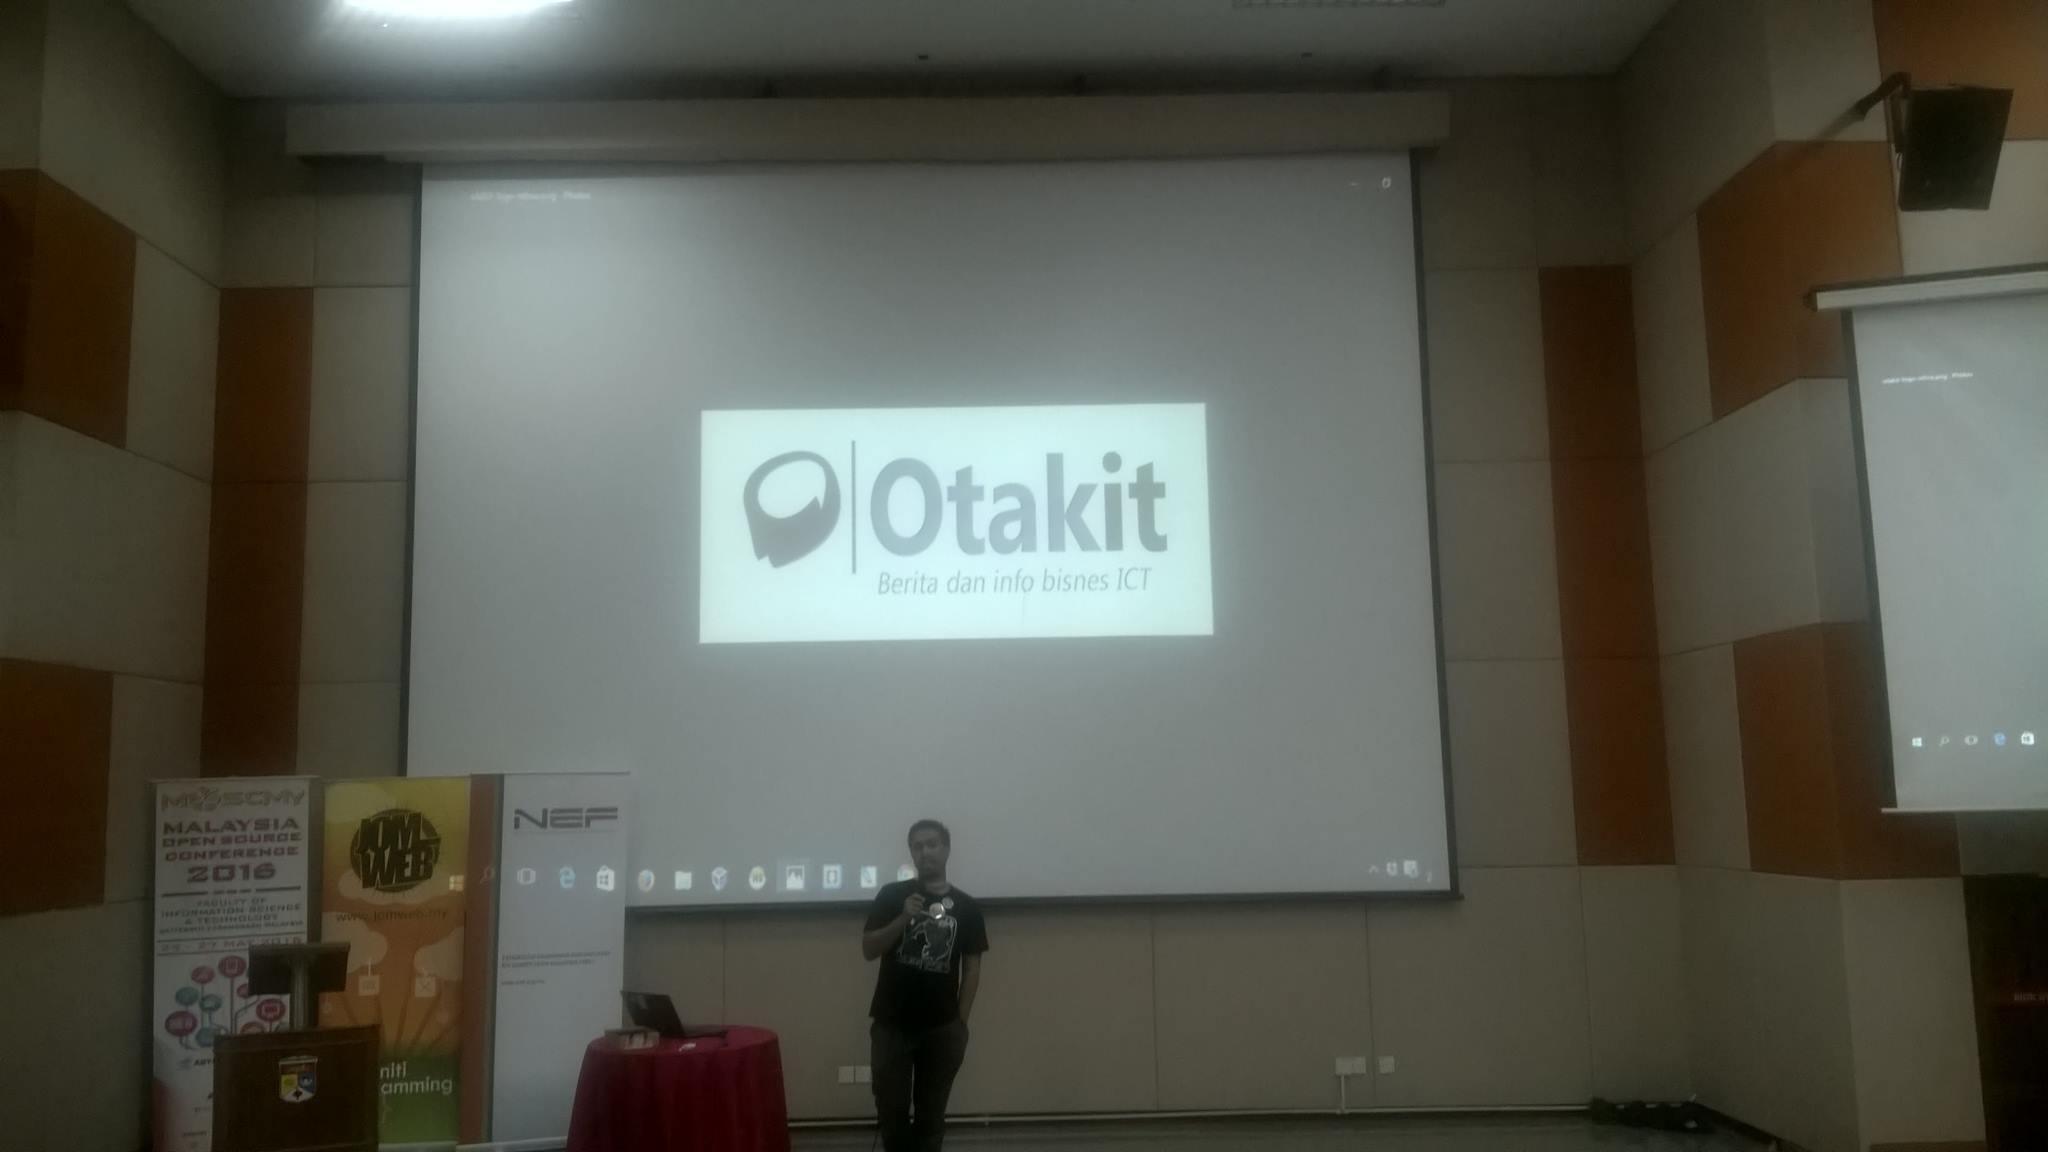 OtakIT for Jomlaunch